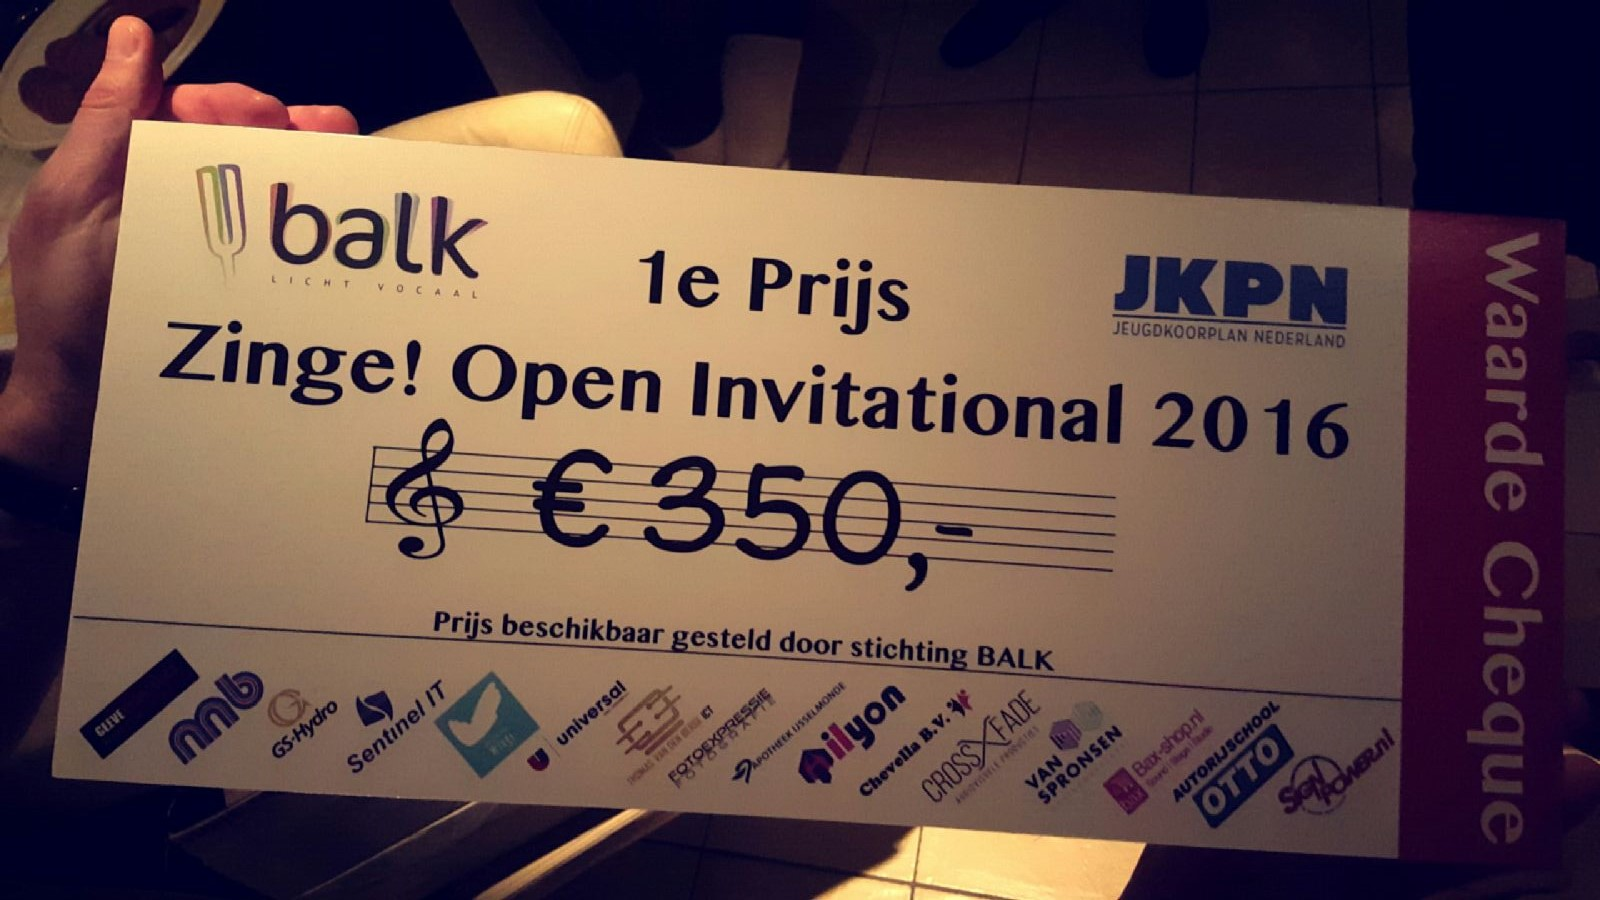 Uitslag Zinge! Open Invitational 2016